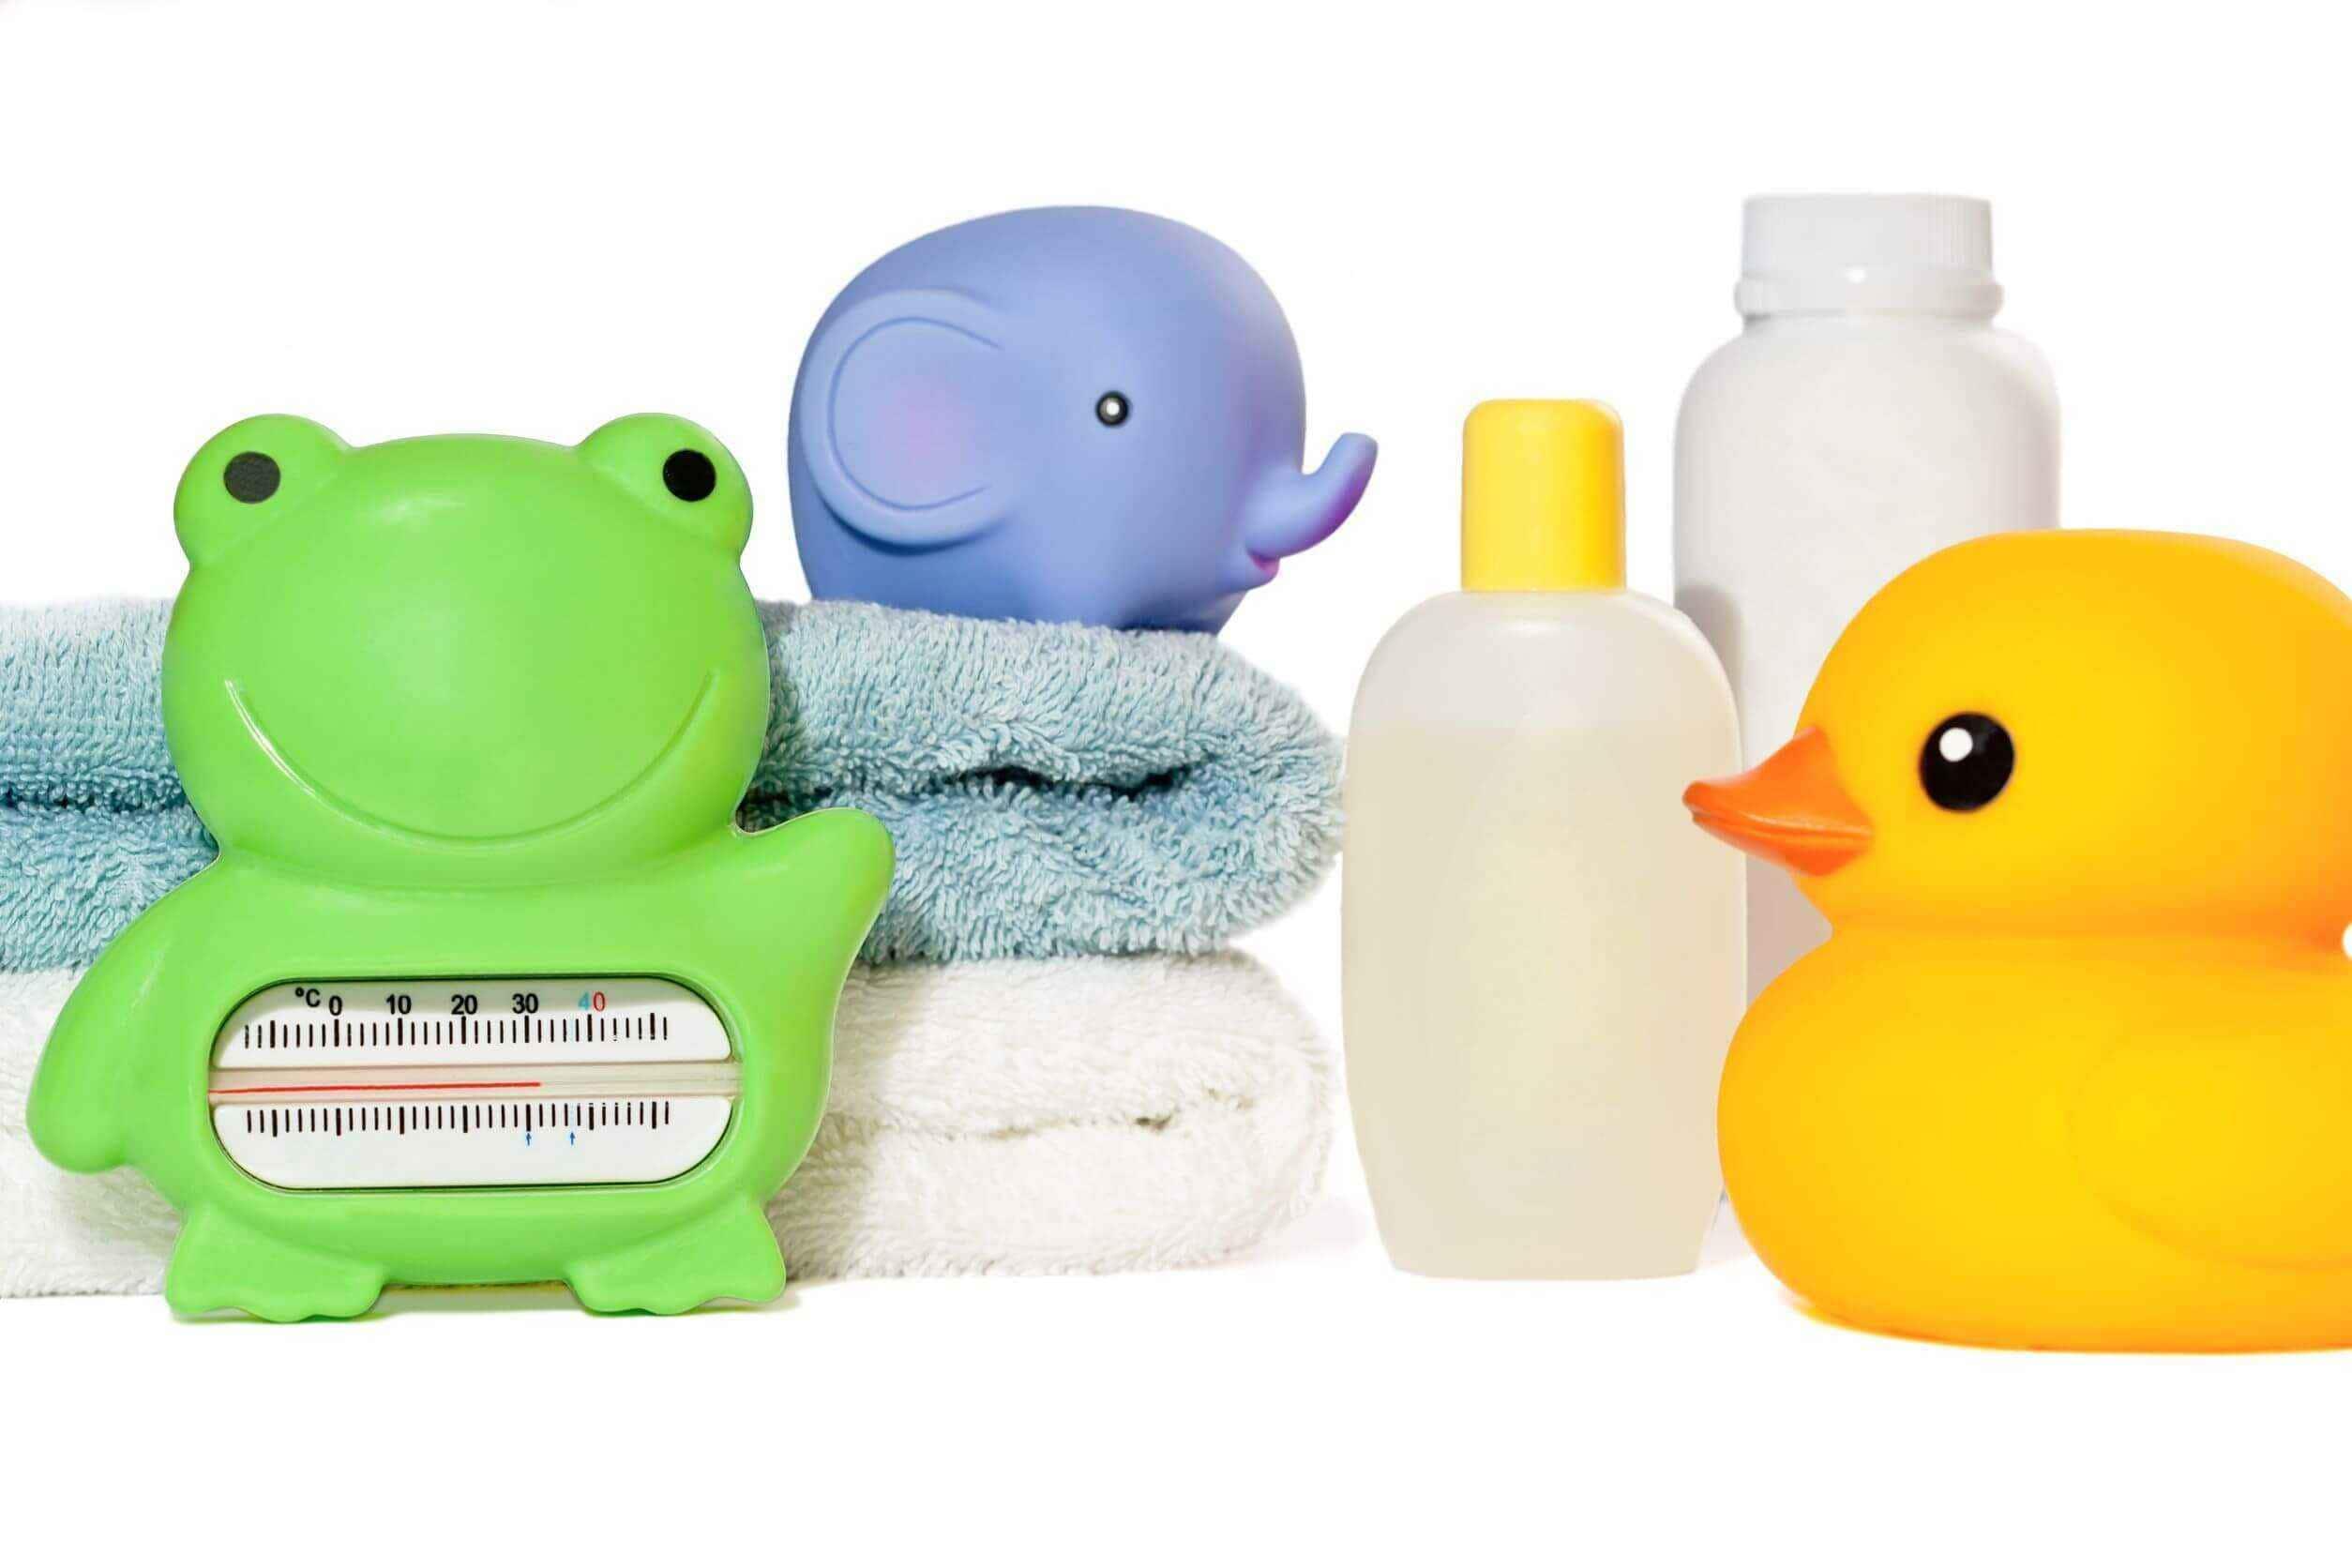 4 Kiat Memilih Produk Perawatan Bayi